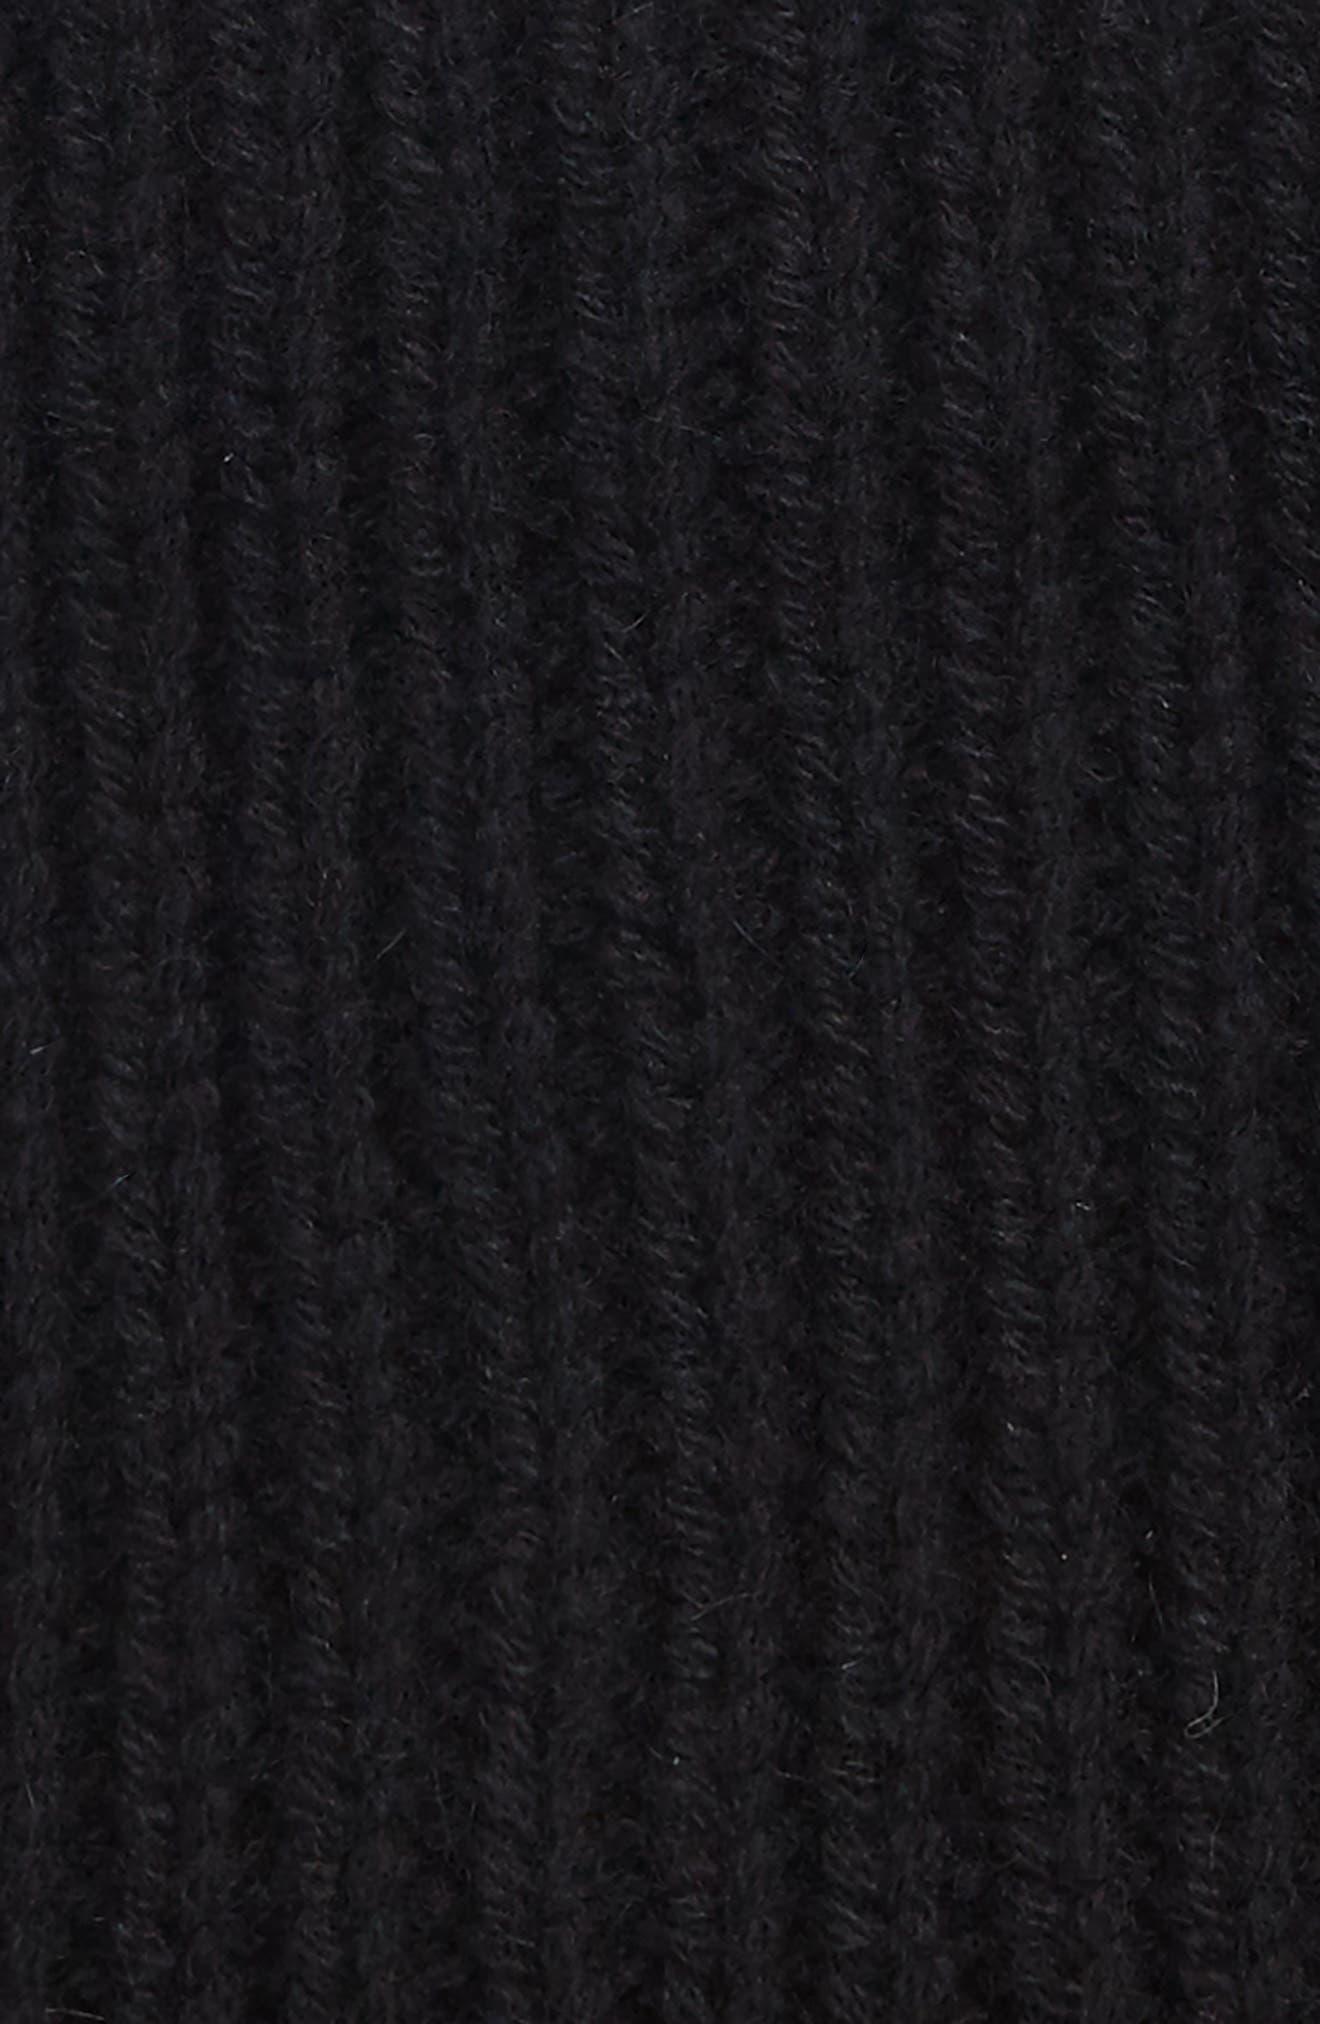 Cardi Wool Blend Beanie,                             Alternate thumbnail 2, color,                             Black